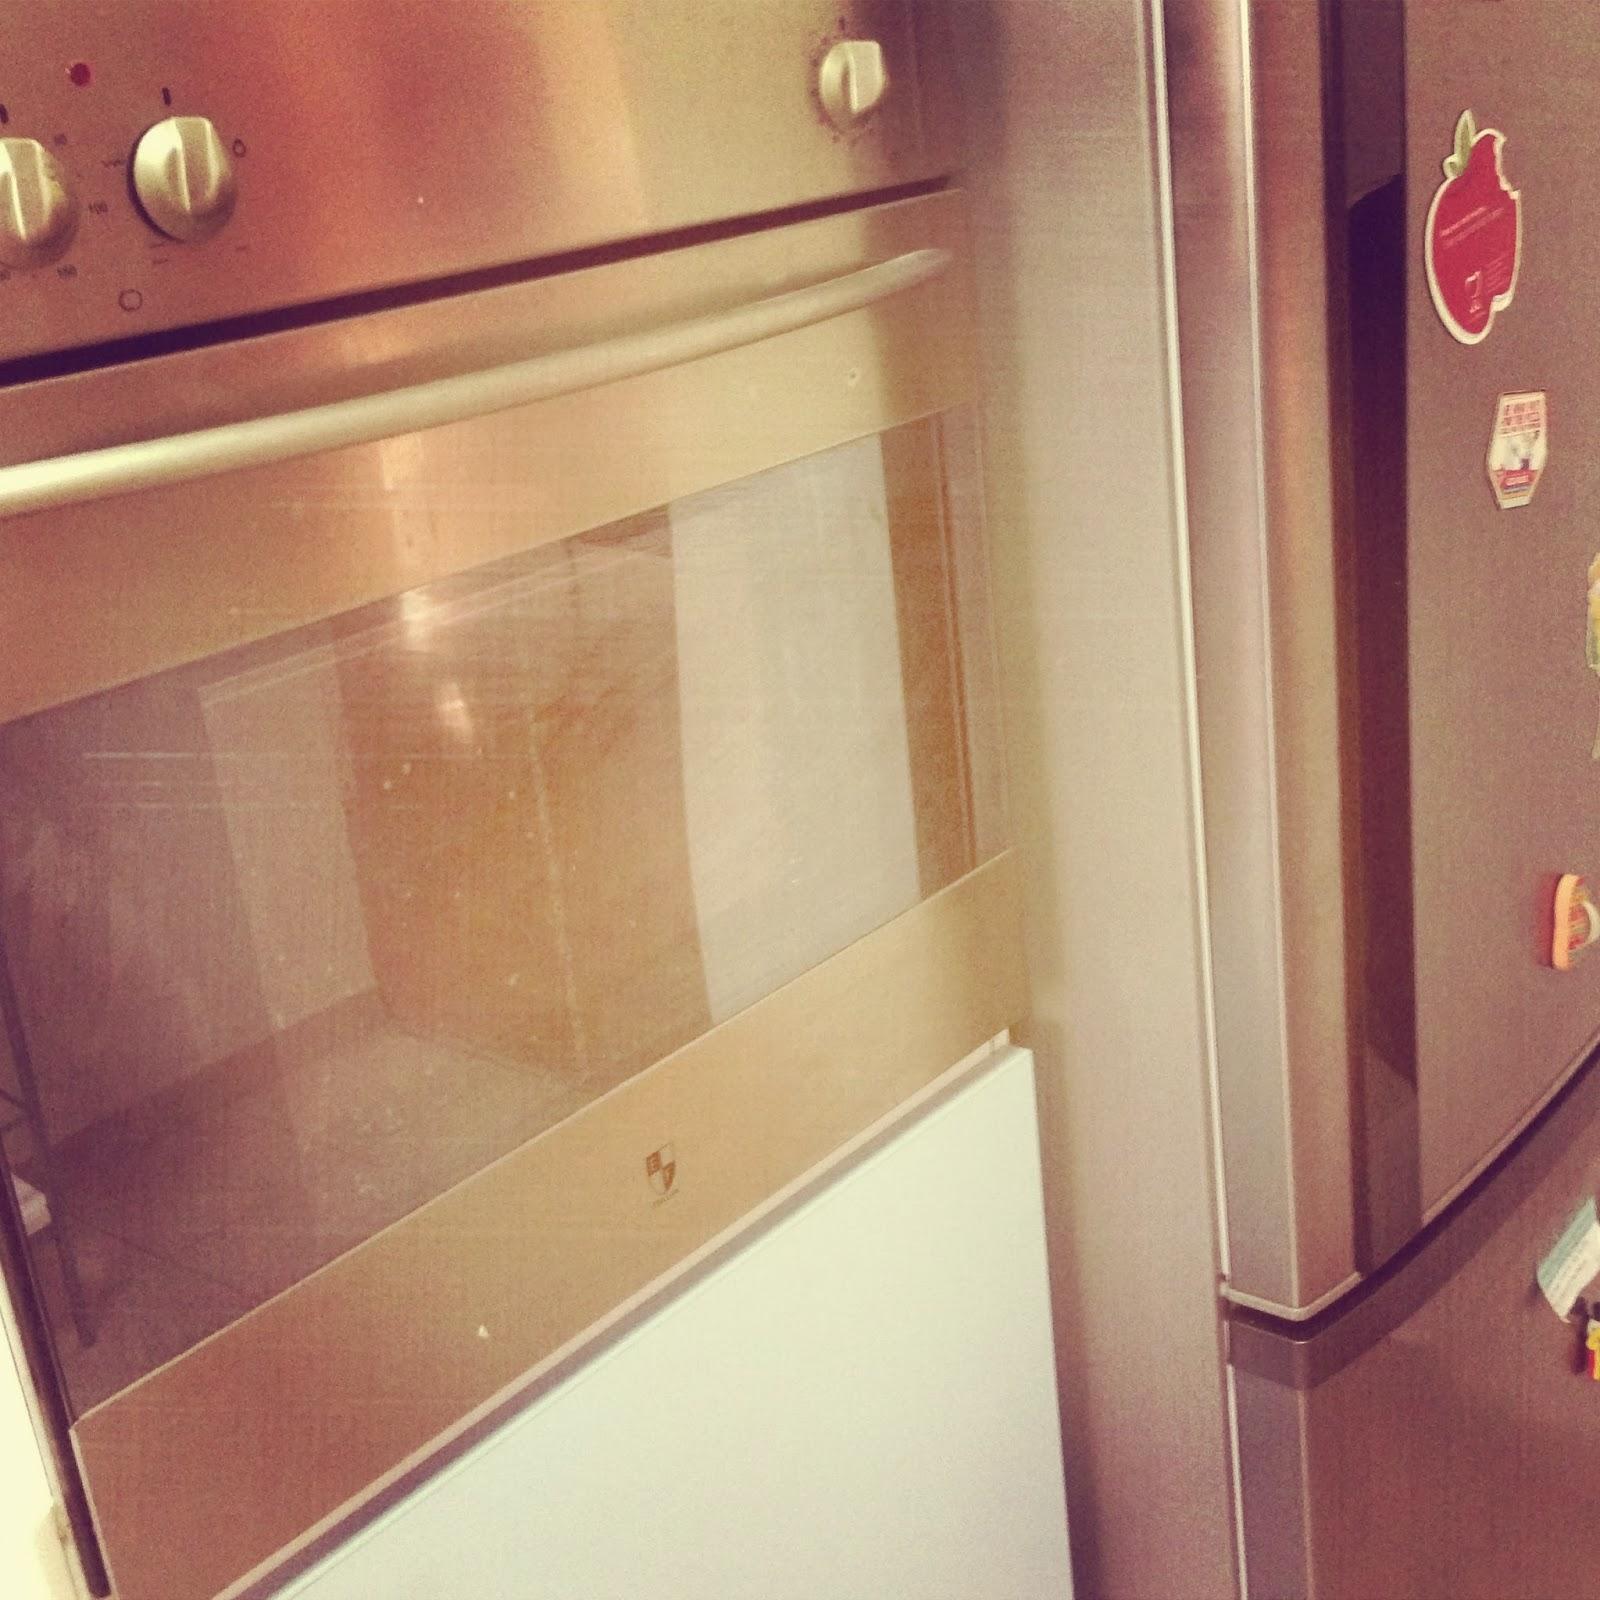 Inspiring Second Hand Cabinets 4 Dark Cherry Kitchen: Cherry Berry : Freestanding Vs. Built-in Appliances